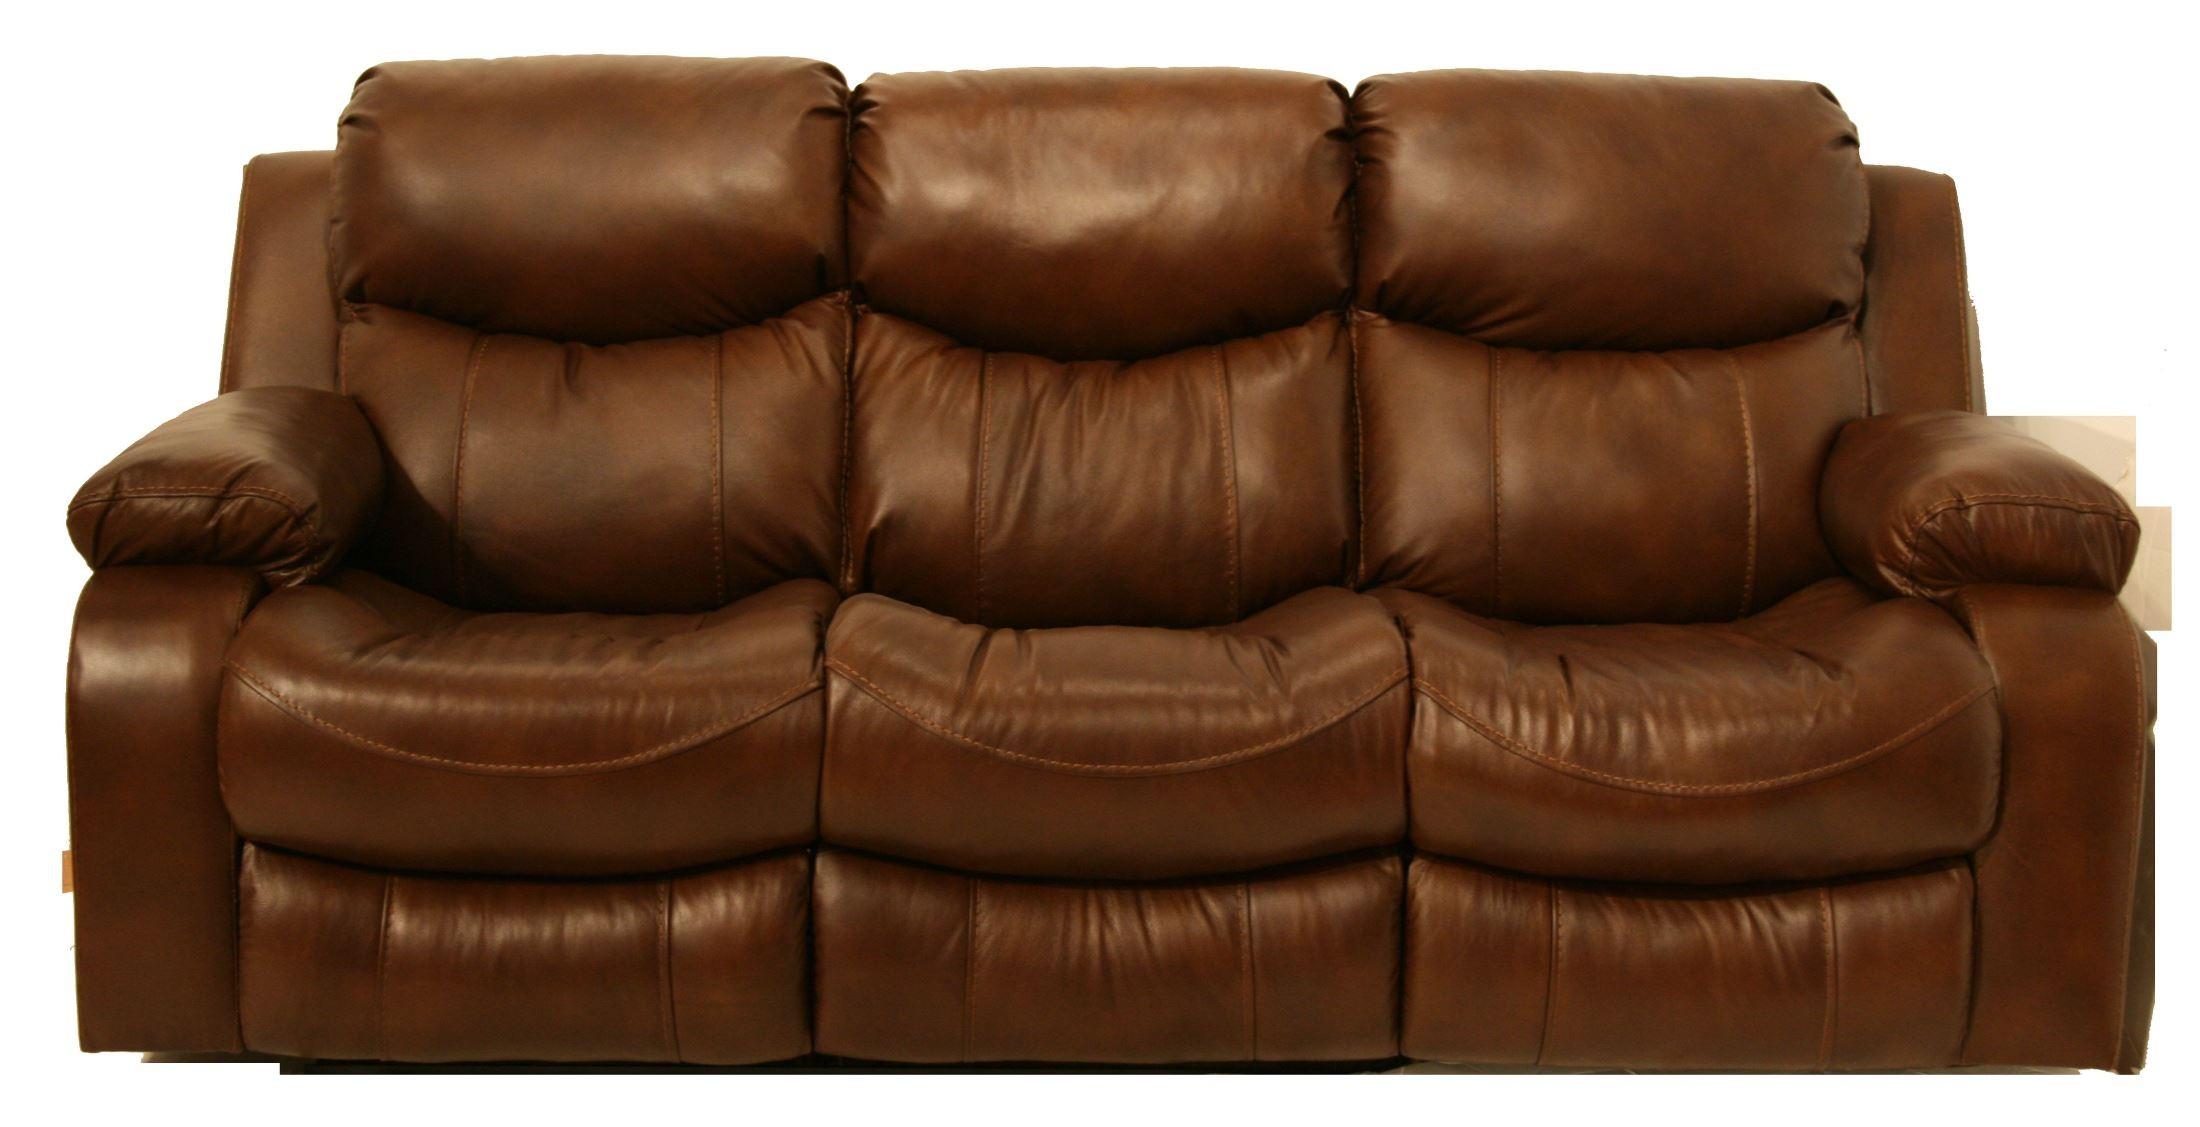 Dallas Tobacco Reclining Sofa From Catnapper